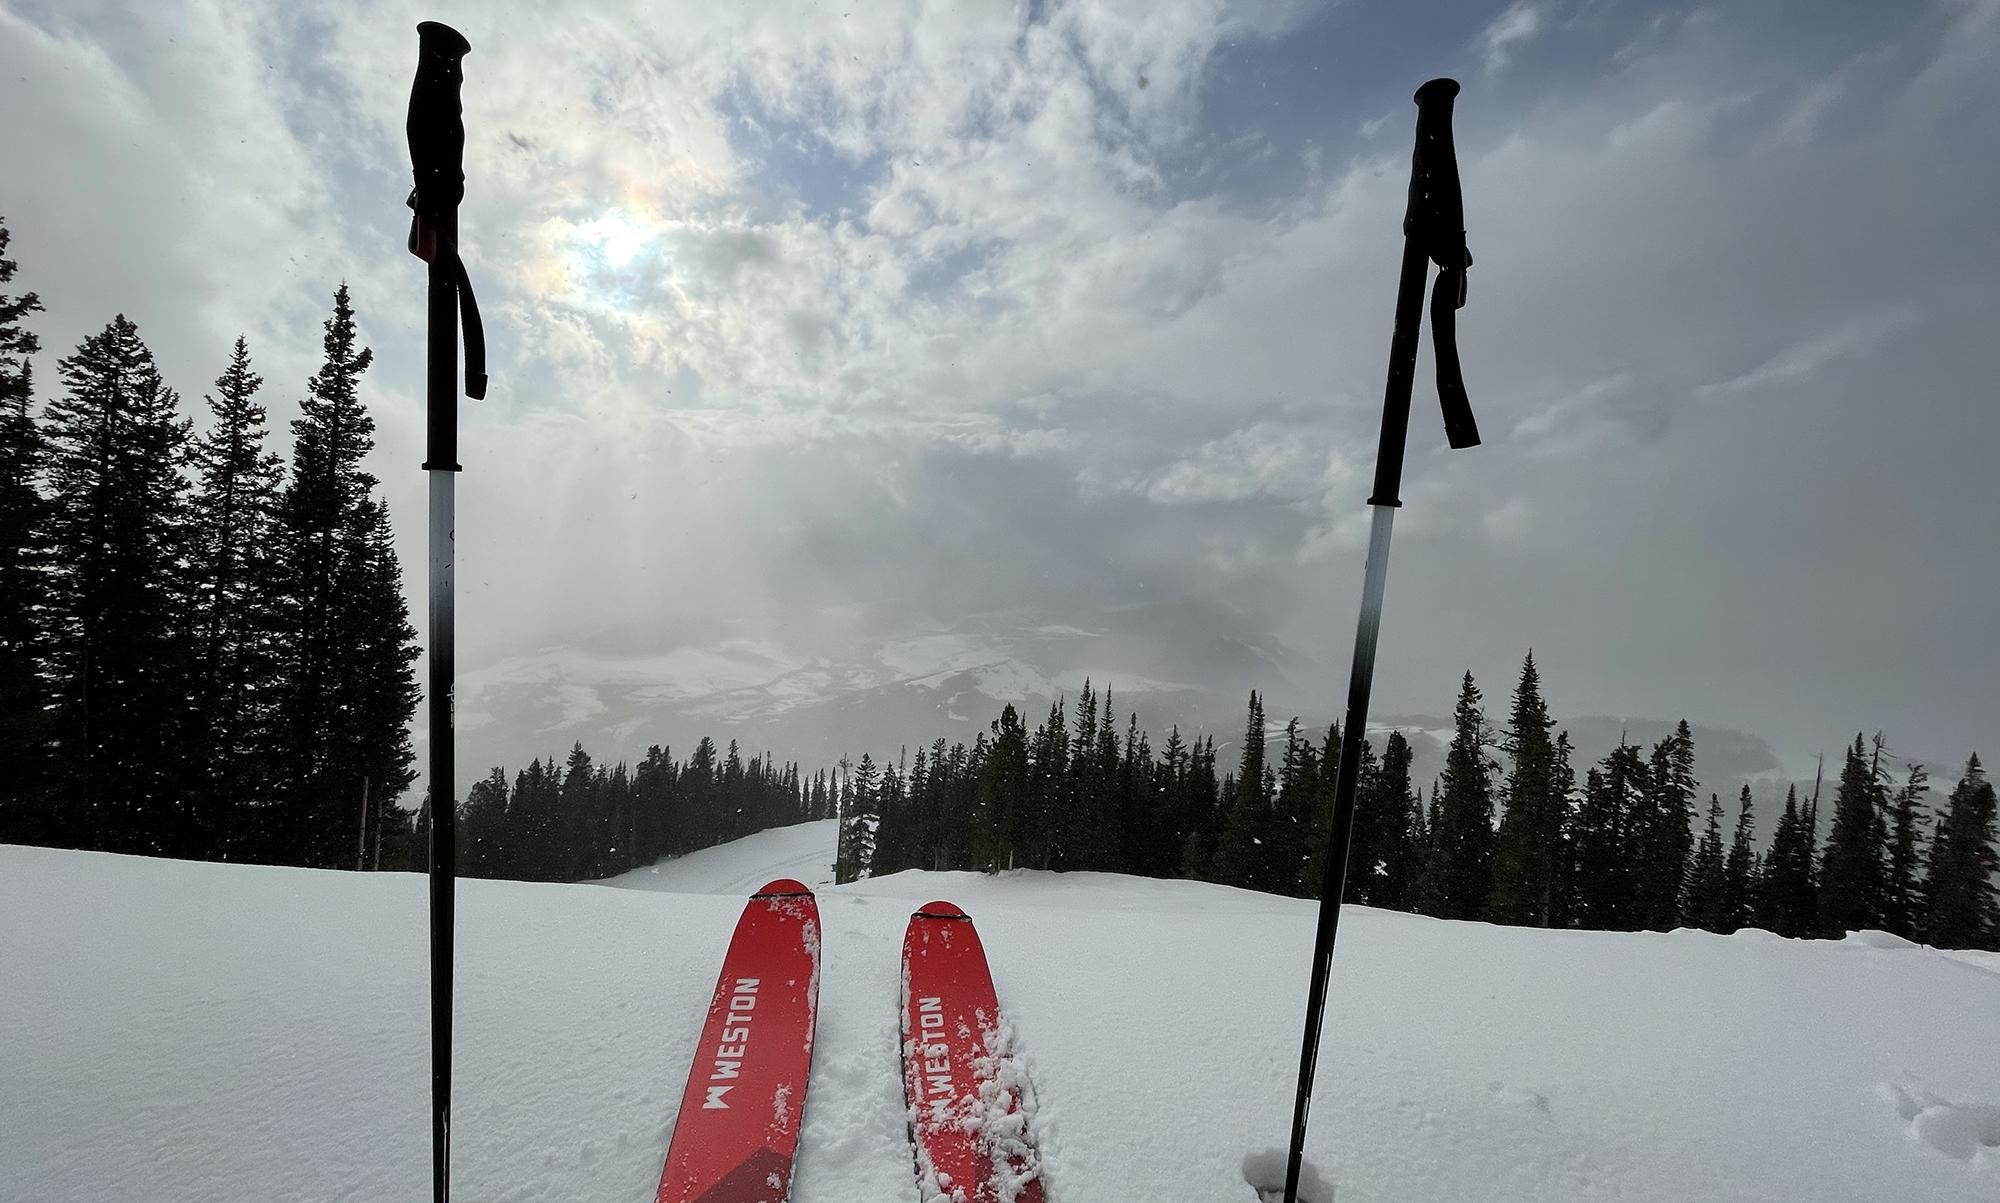 Luke Koppa reviews the Weston Summit ski for Blister